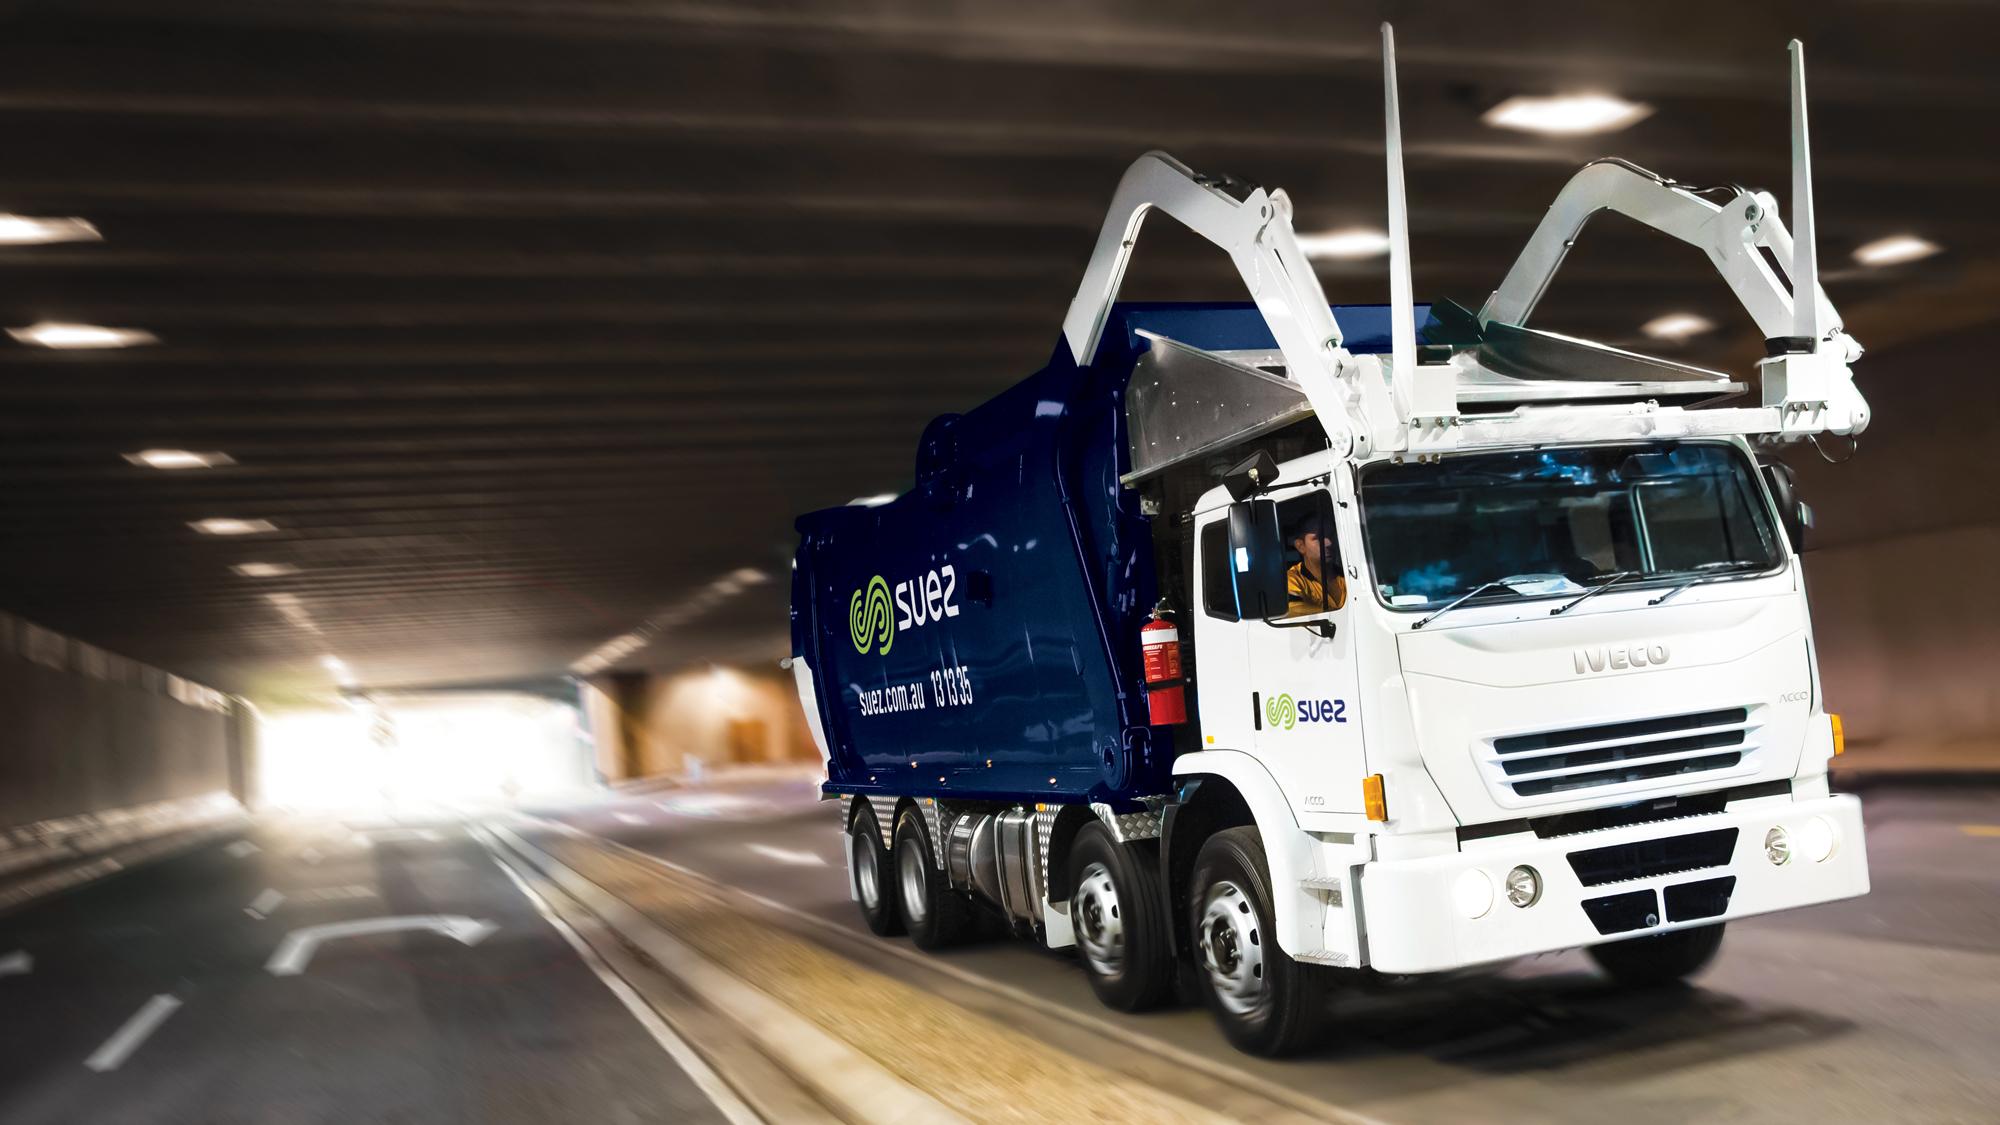 SUEZ businesses total waste management solutions header 2000x1125